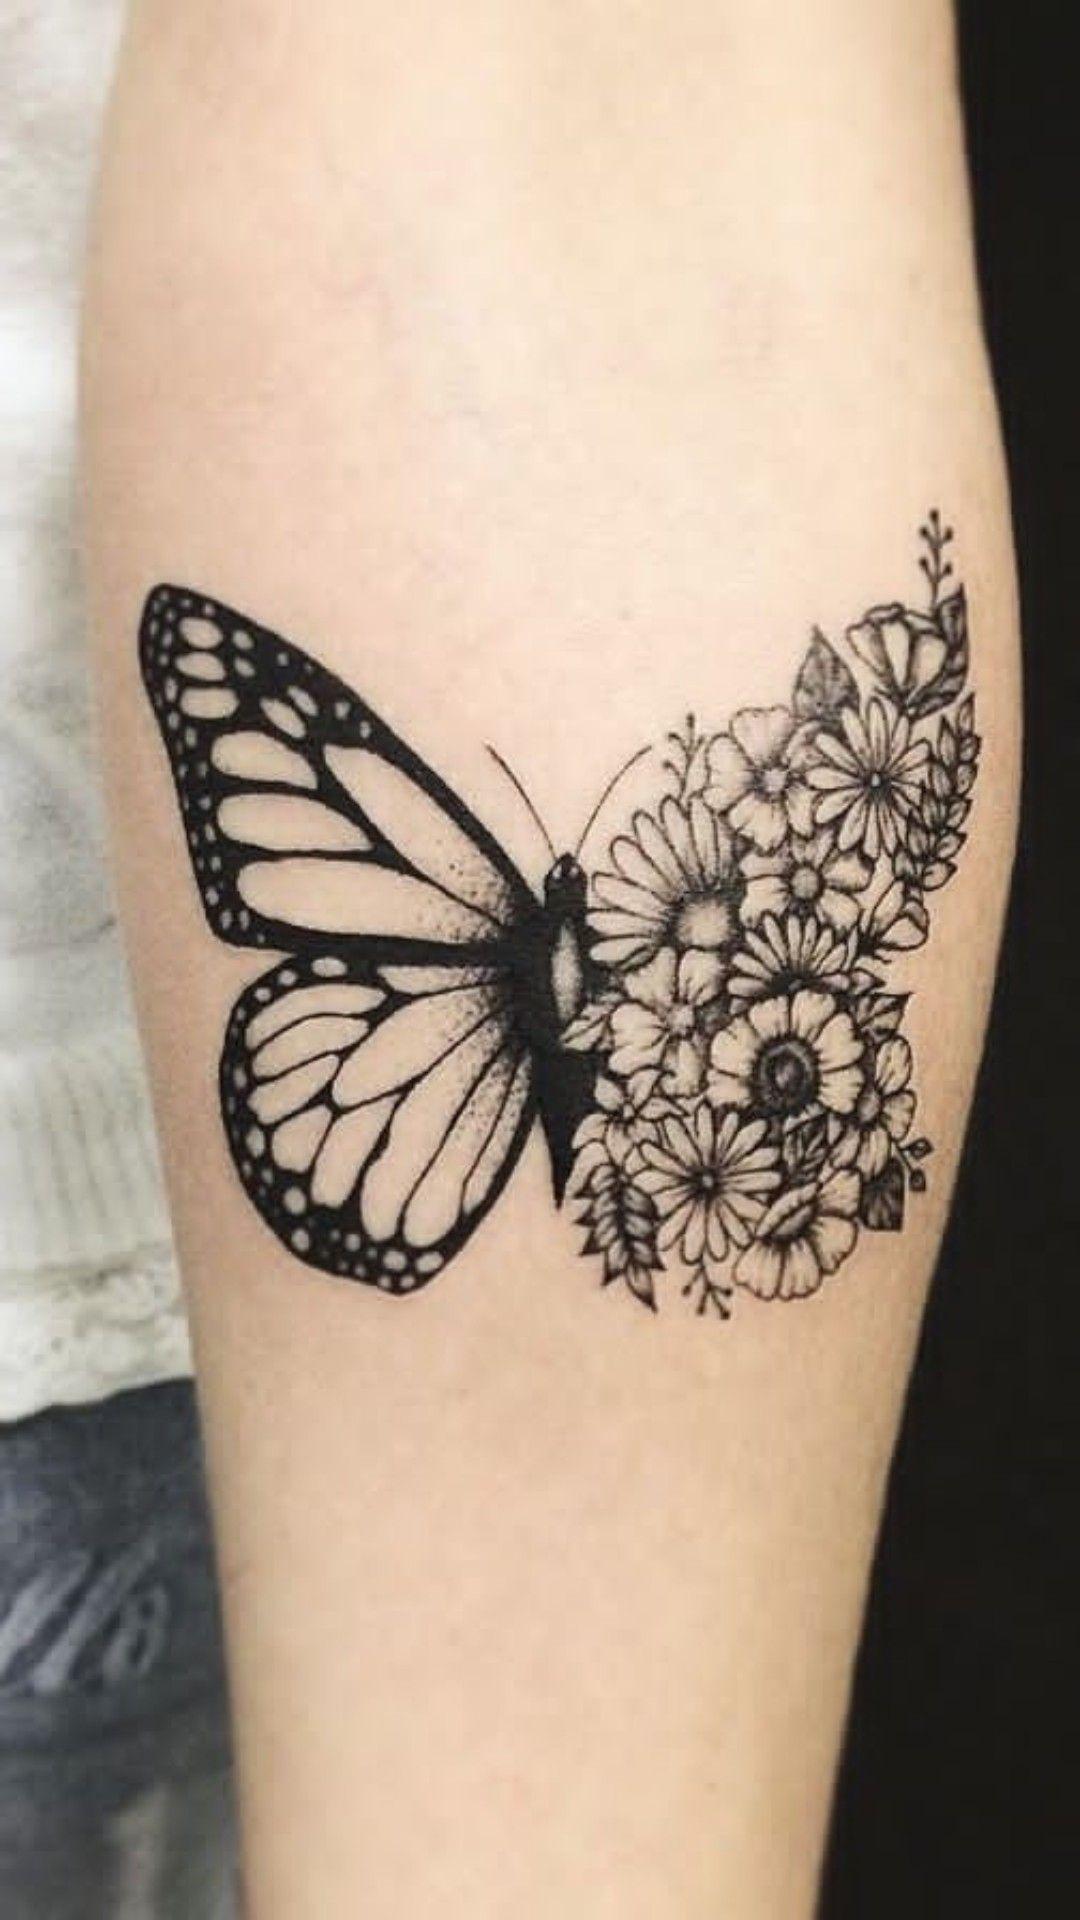 Pin By Hailey Rockafellow On Piercings Tattoos In 2020 Sleeve Tattoos Butterfly Tattoo Wrist Tattoos